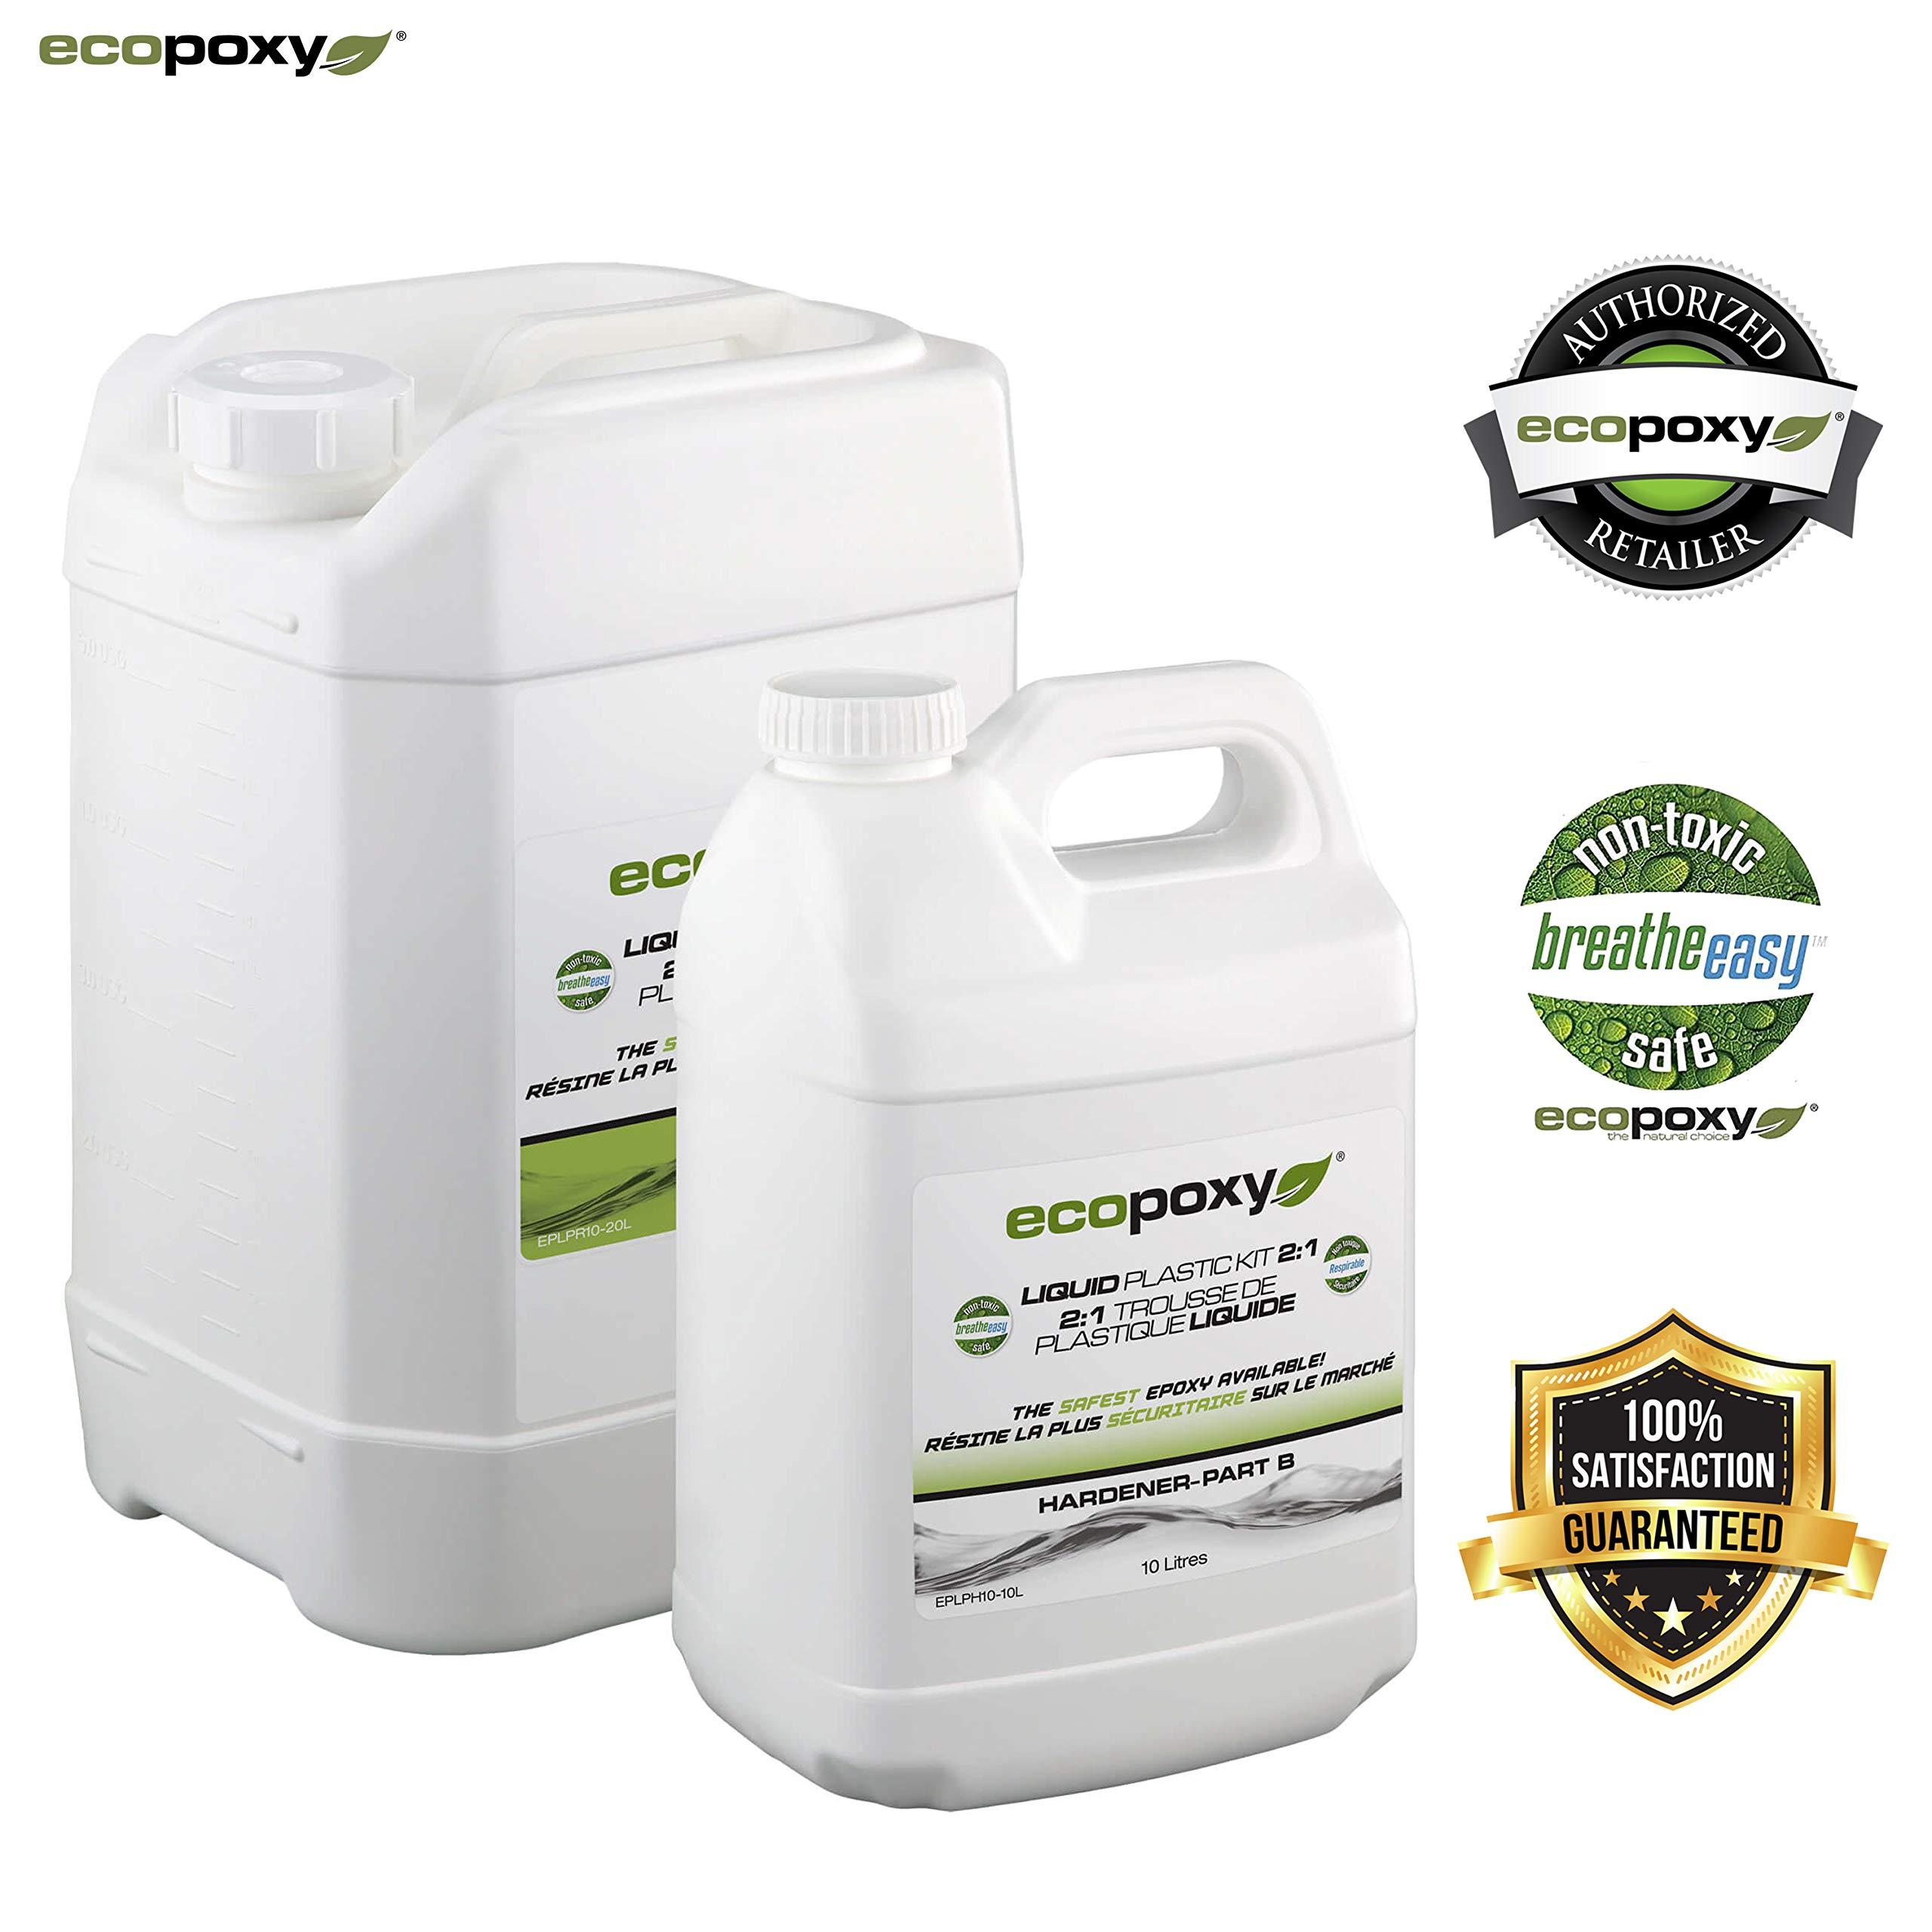 Ecopoxy | Epoxy Resin | Liquid Plastic 2:1 Ratio (30L (7.9 gal) kit)